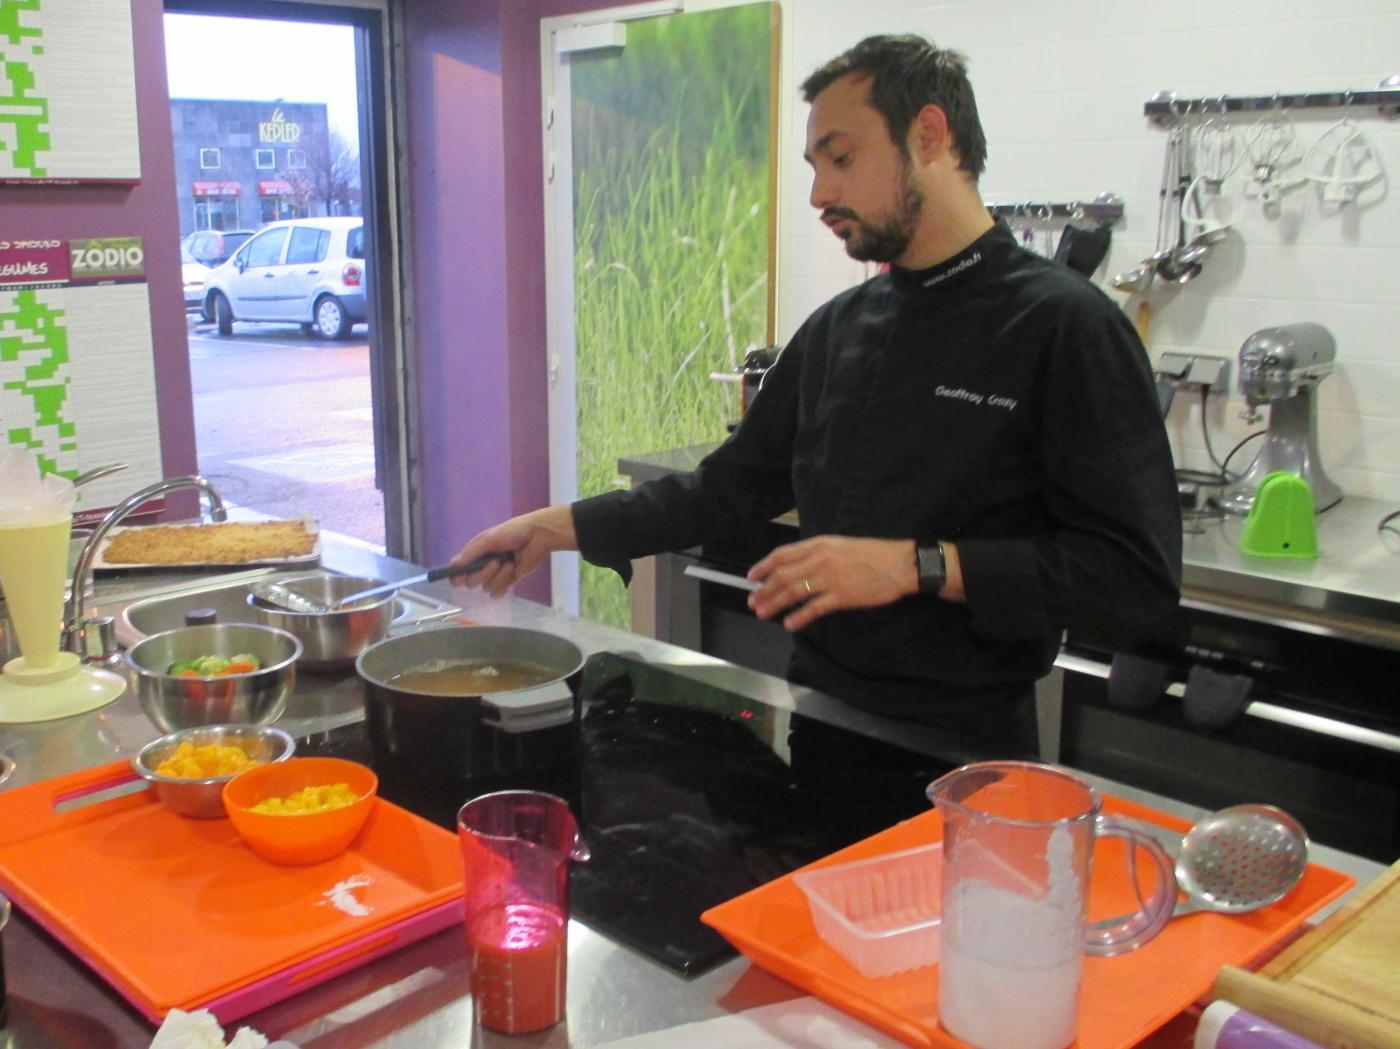 Ateler cuisine: menu indien